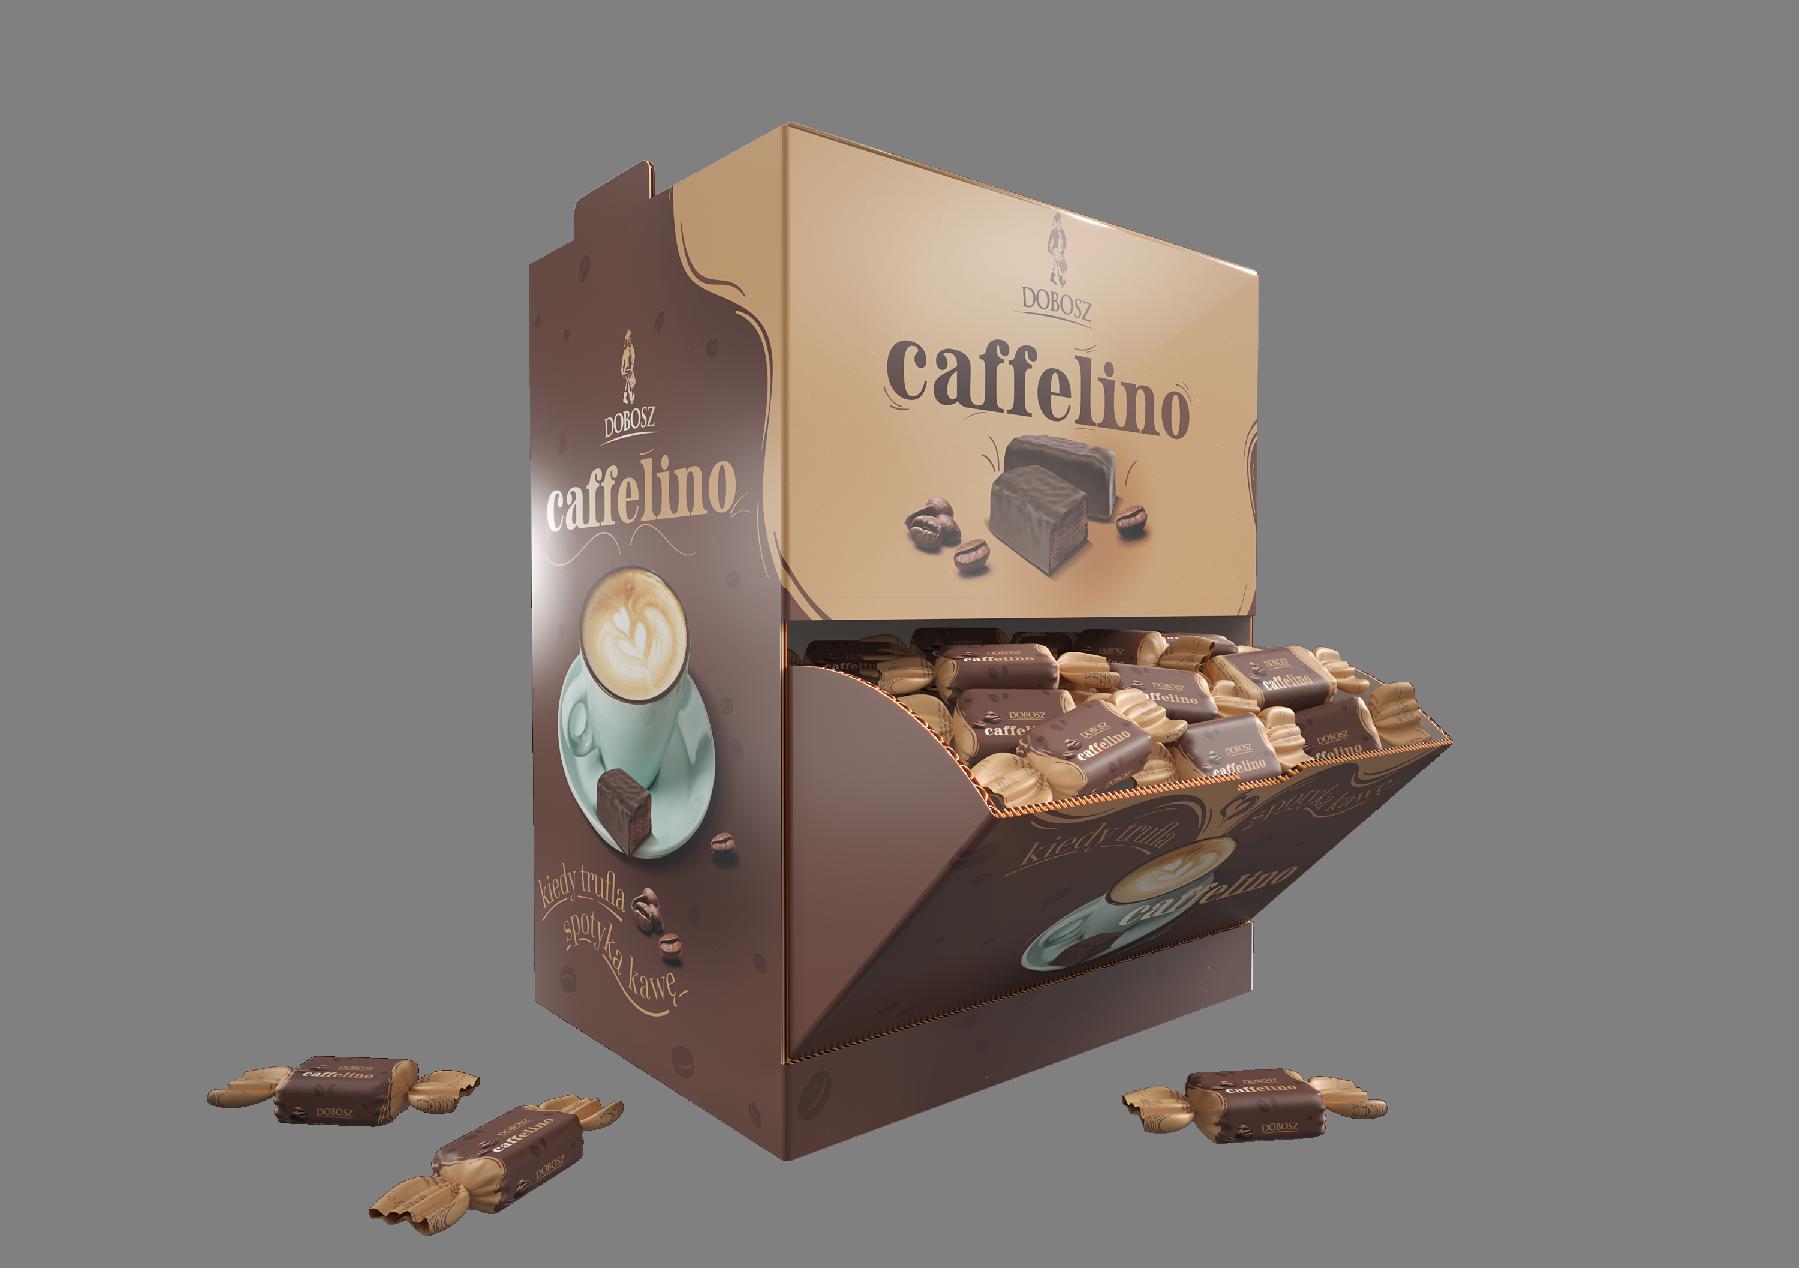 Caffelino